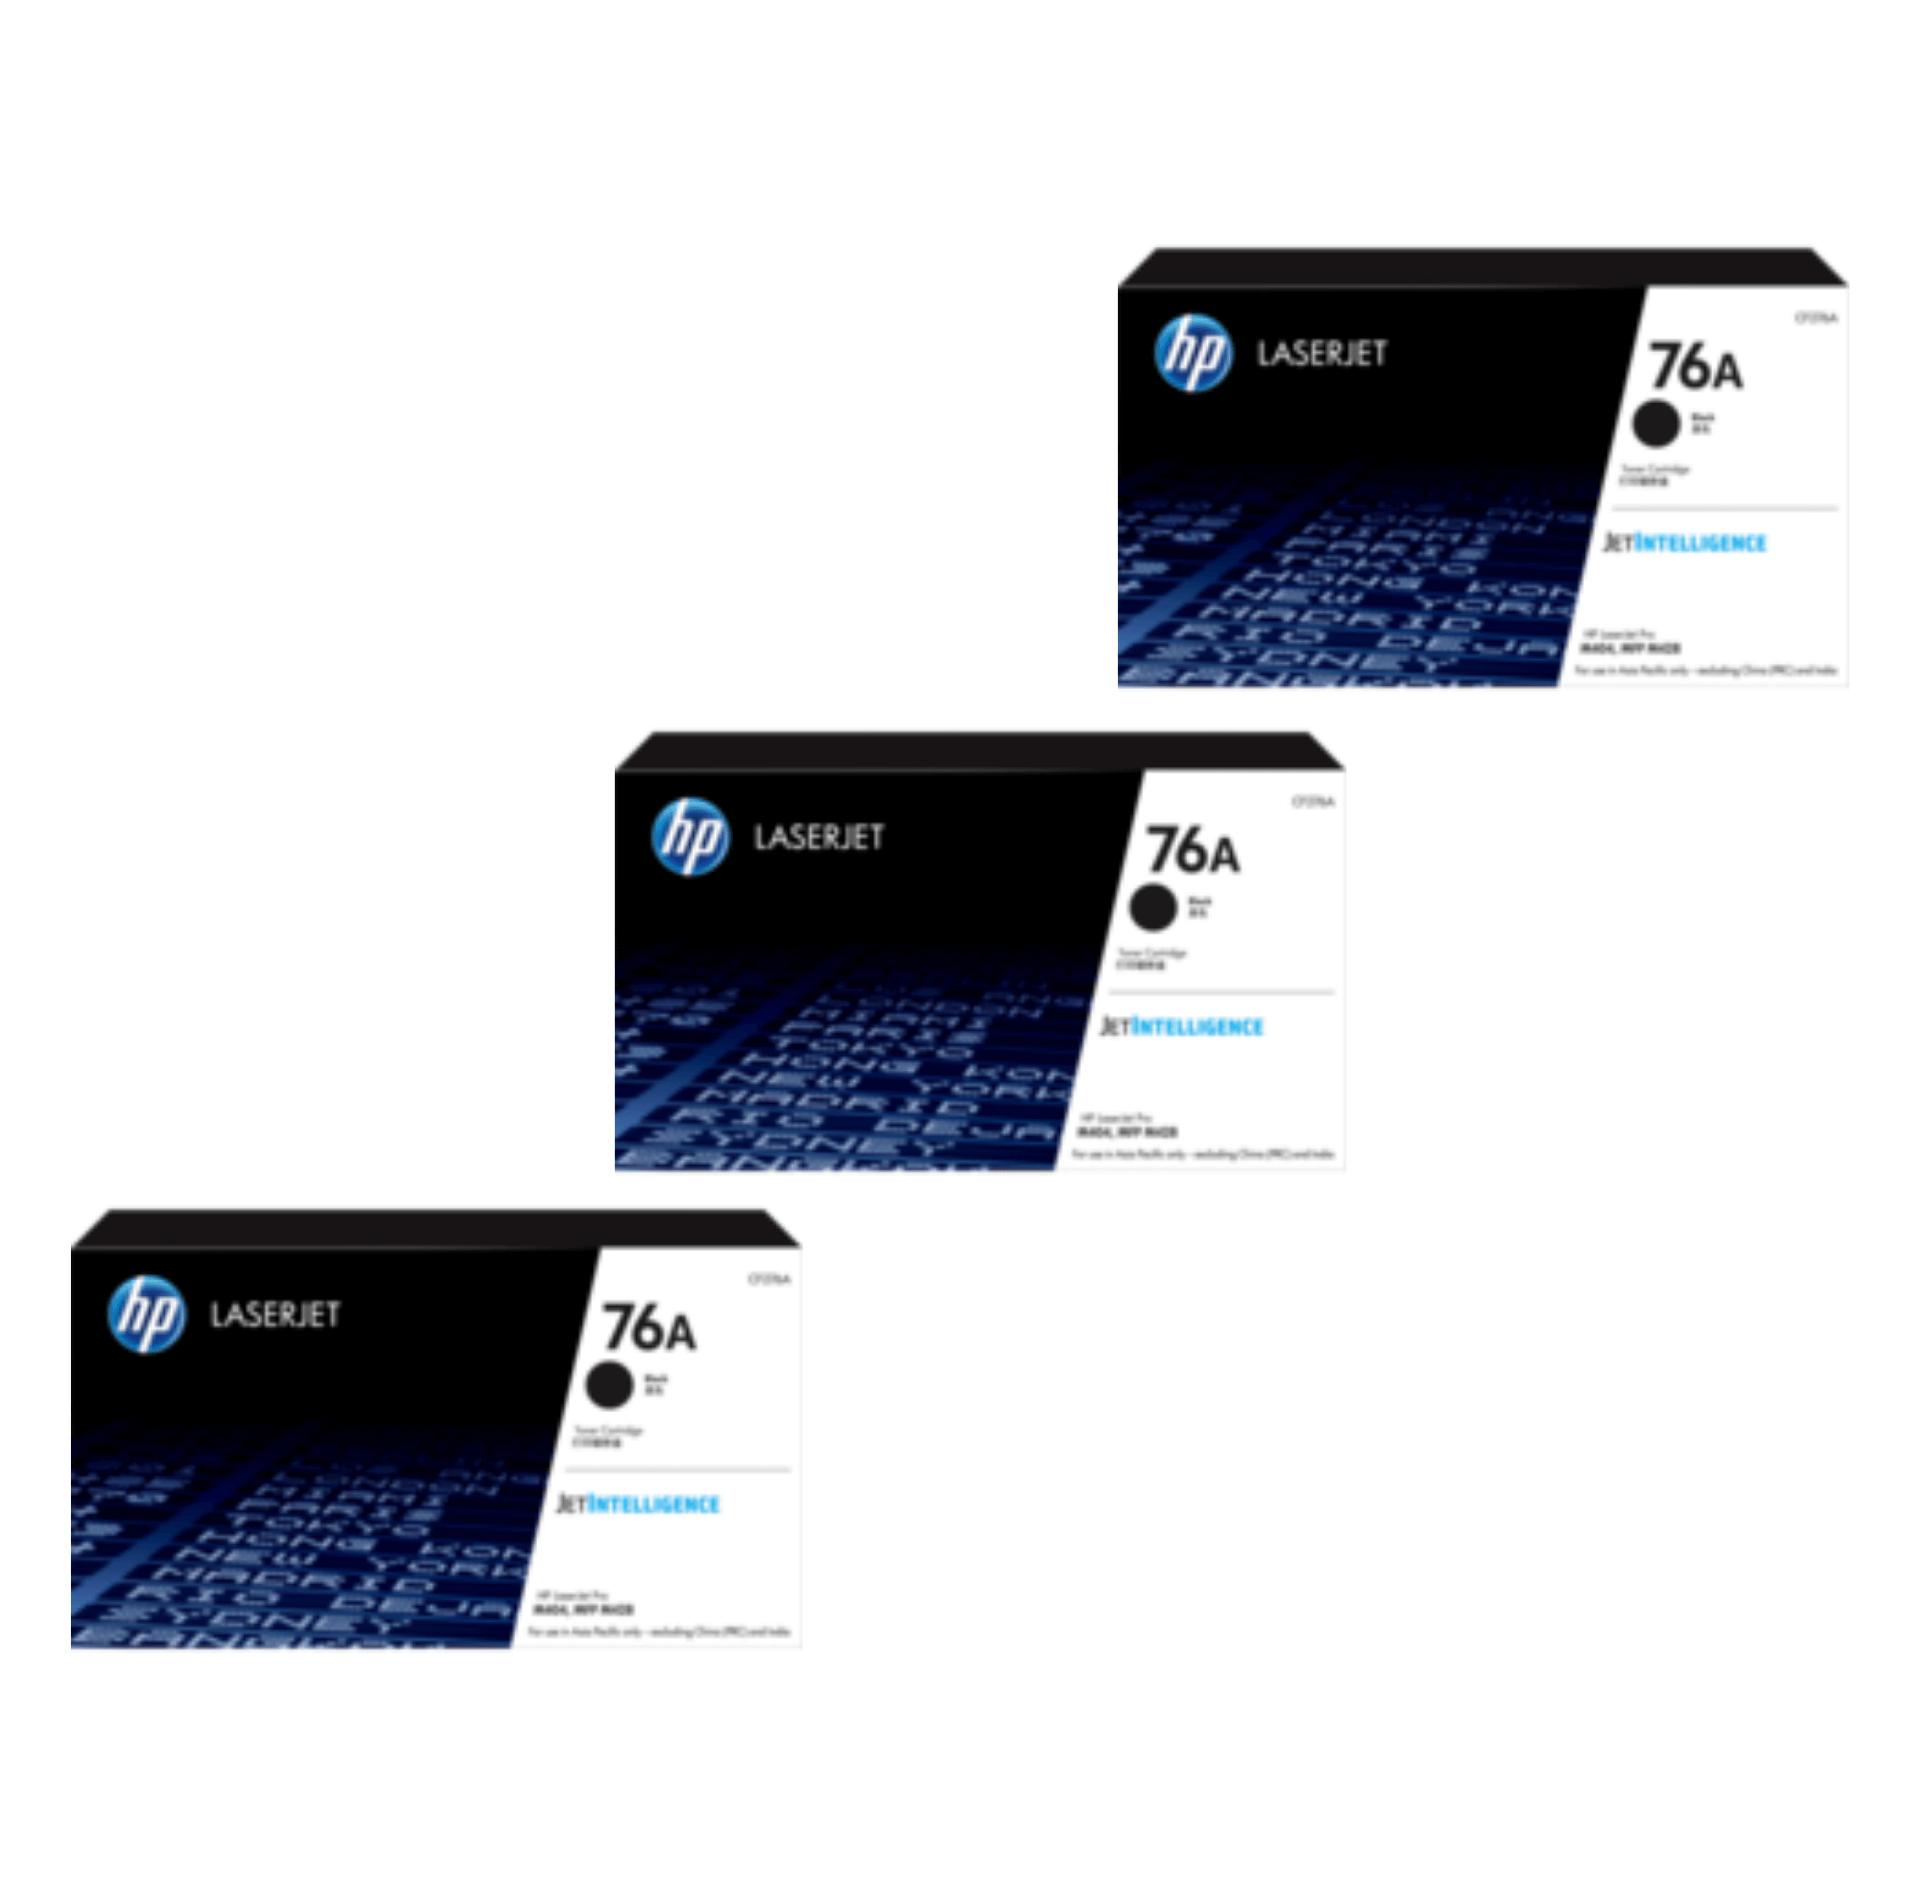 HP 76A Toner Cartridges Value Pack - Includes: [3 x Black]